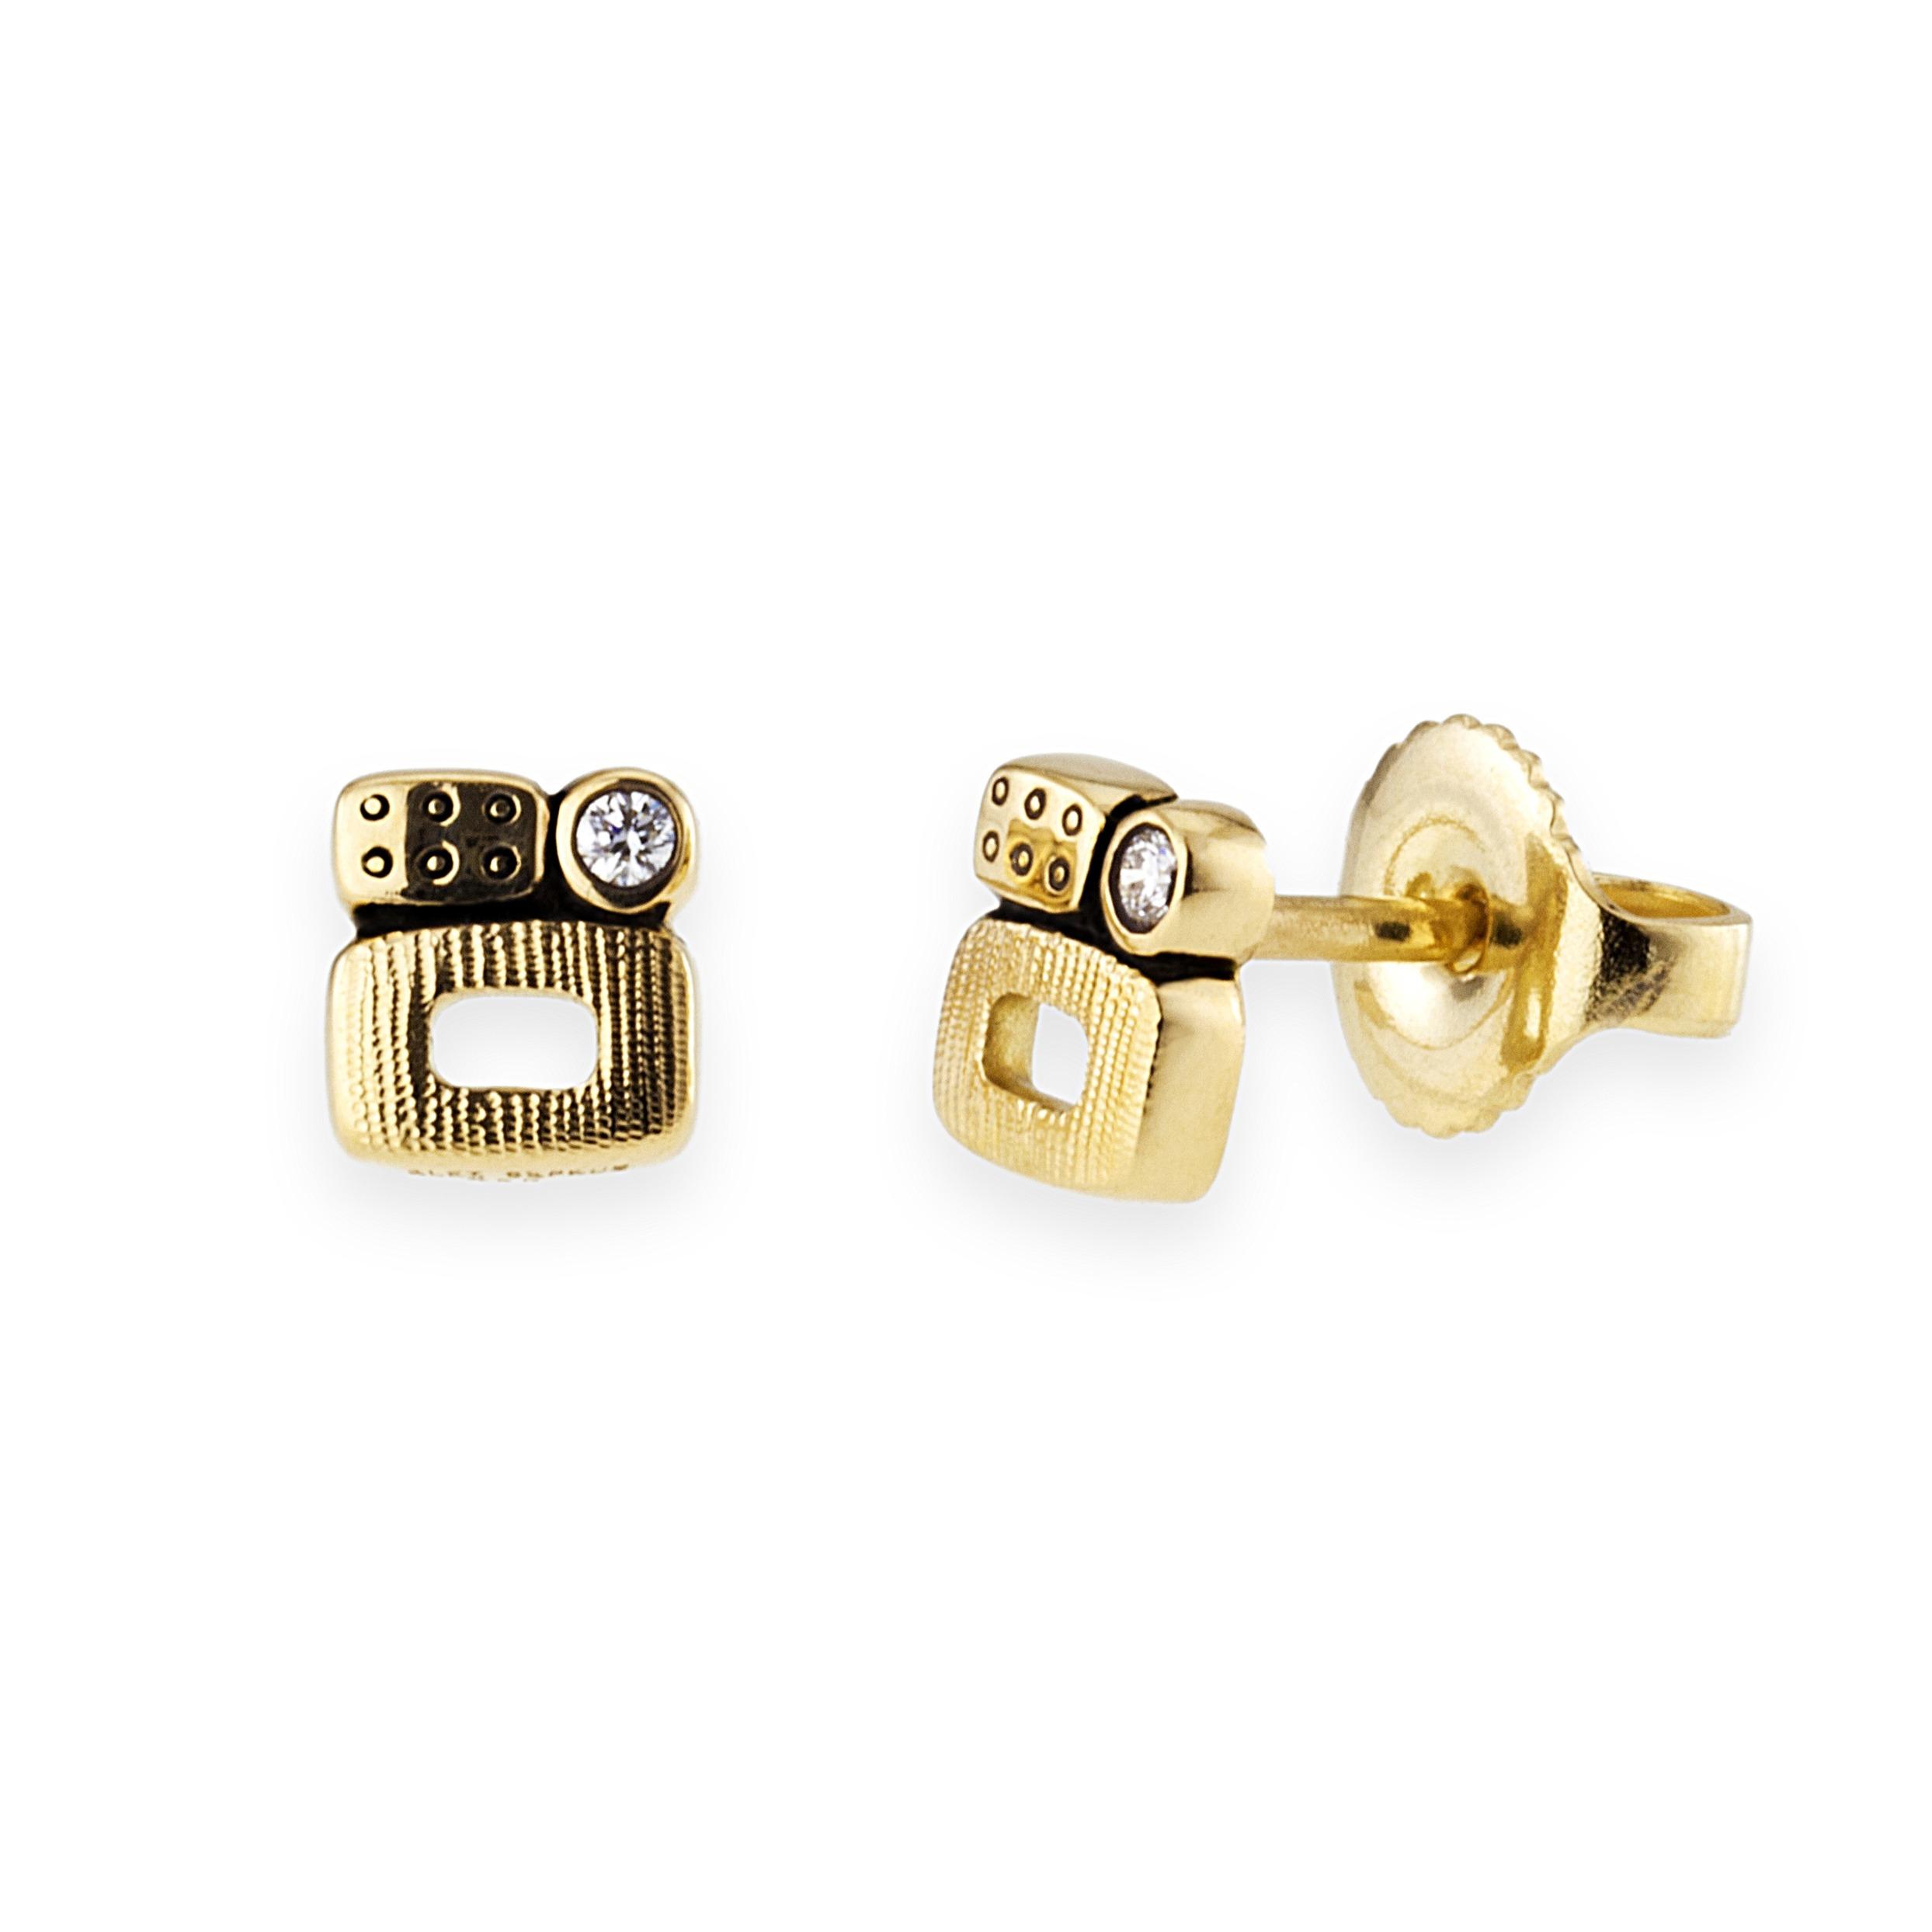 Little Windows Yellow Gold With Diamond Earrings Mccaskill And Company Destin Fl